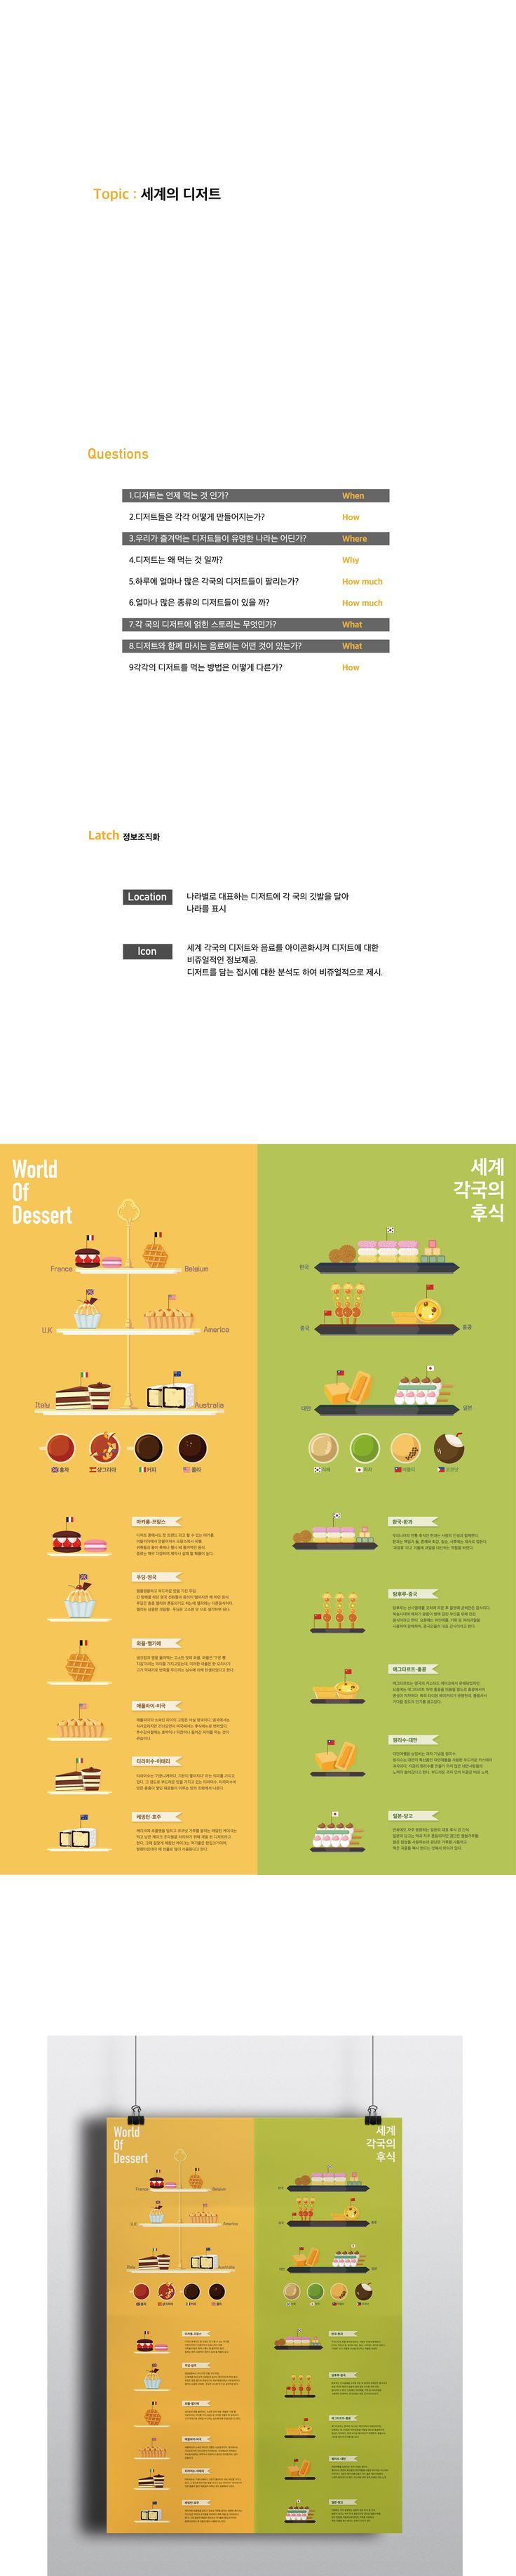 Jung Eun ji│ Information Design 2015│ Major in Digital Media Design │#hicoda │hicoda.hongik.ac.kr